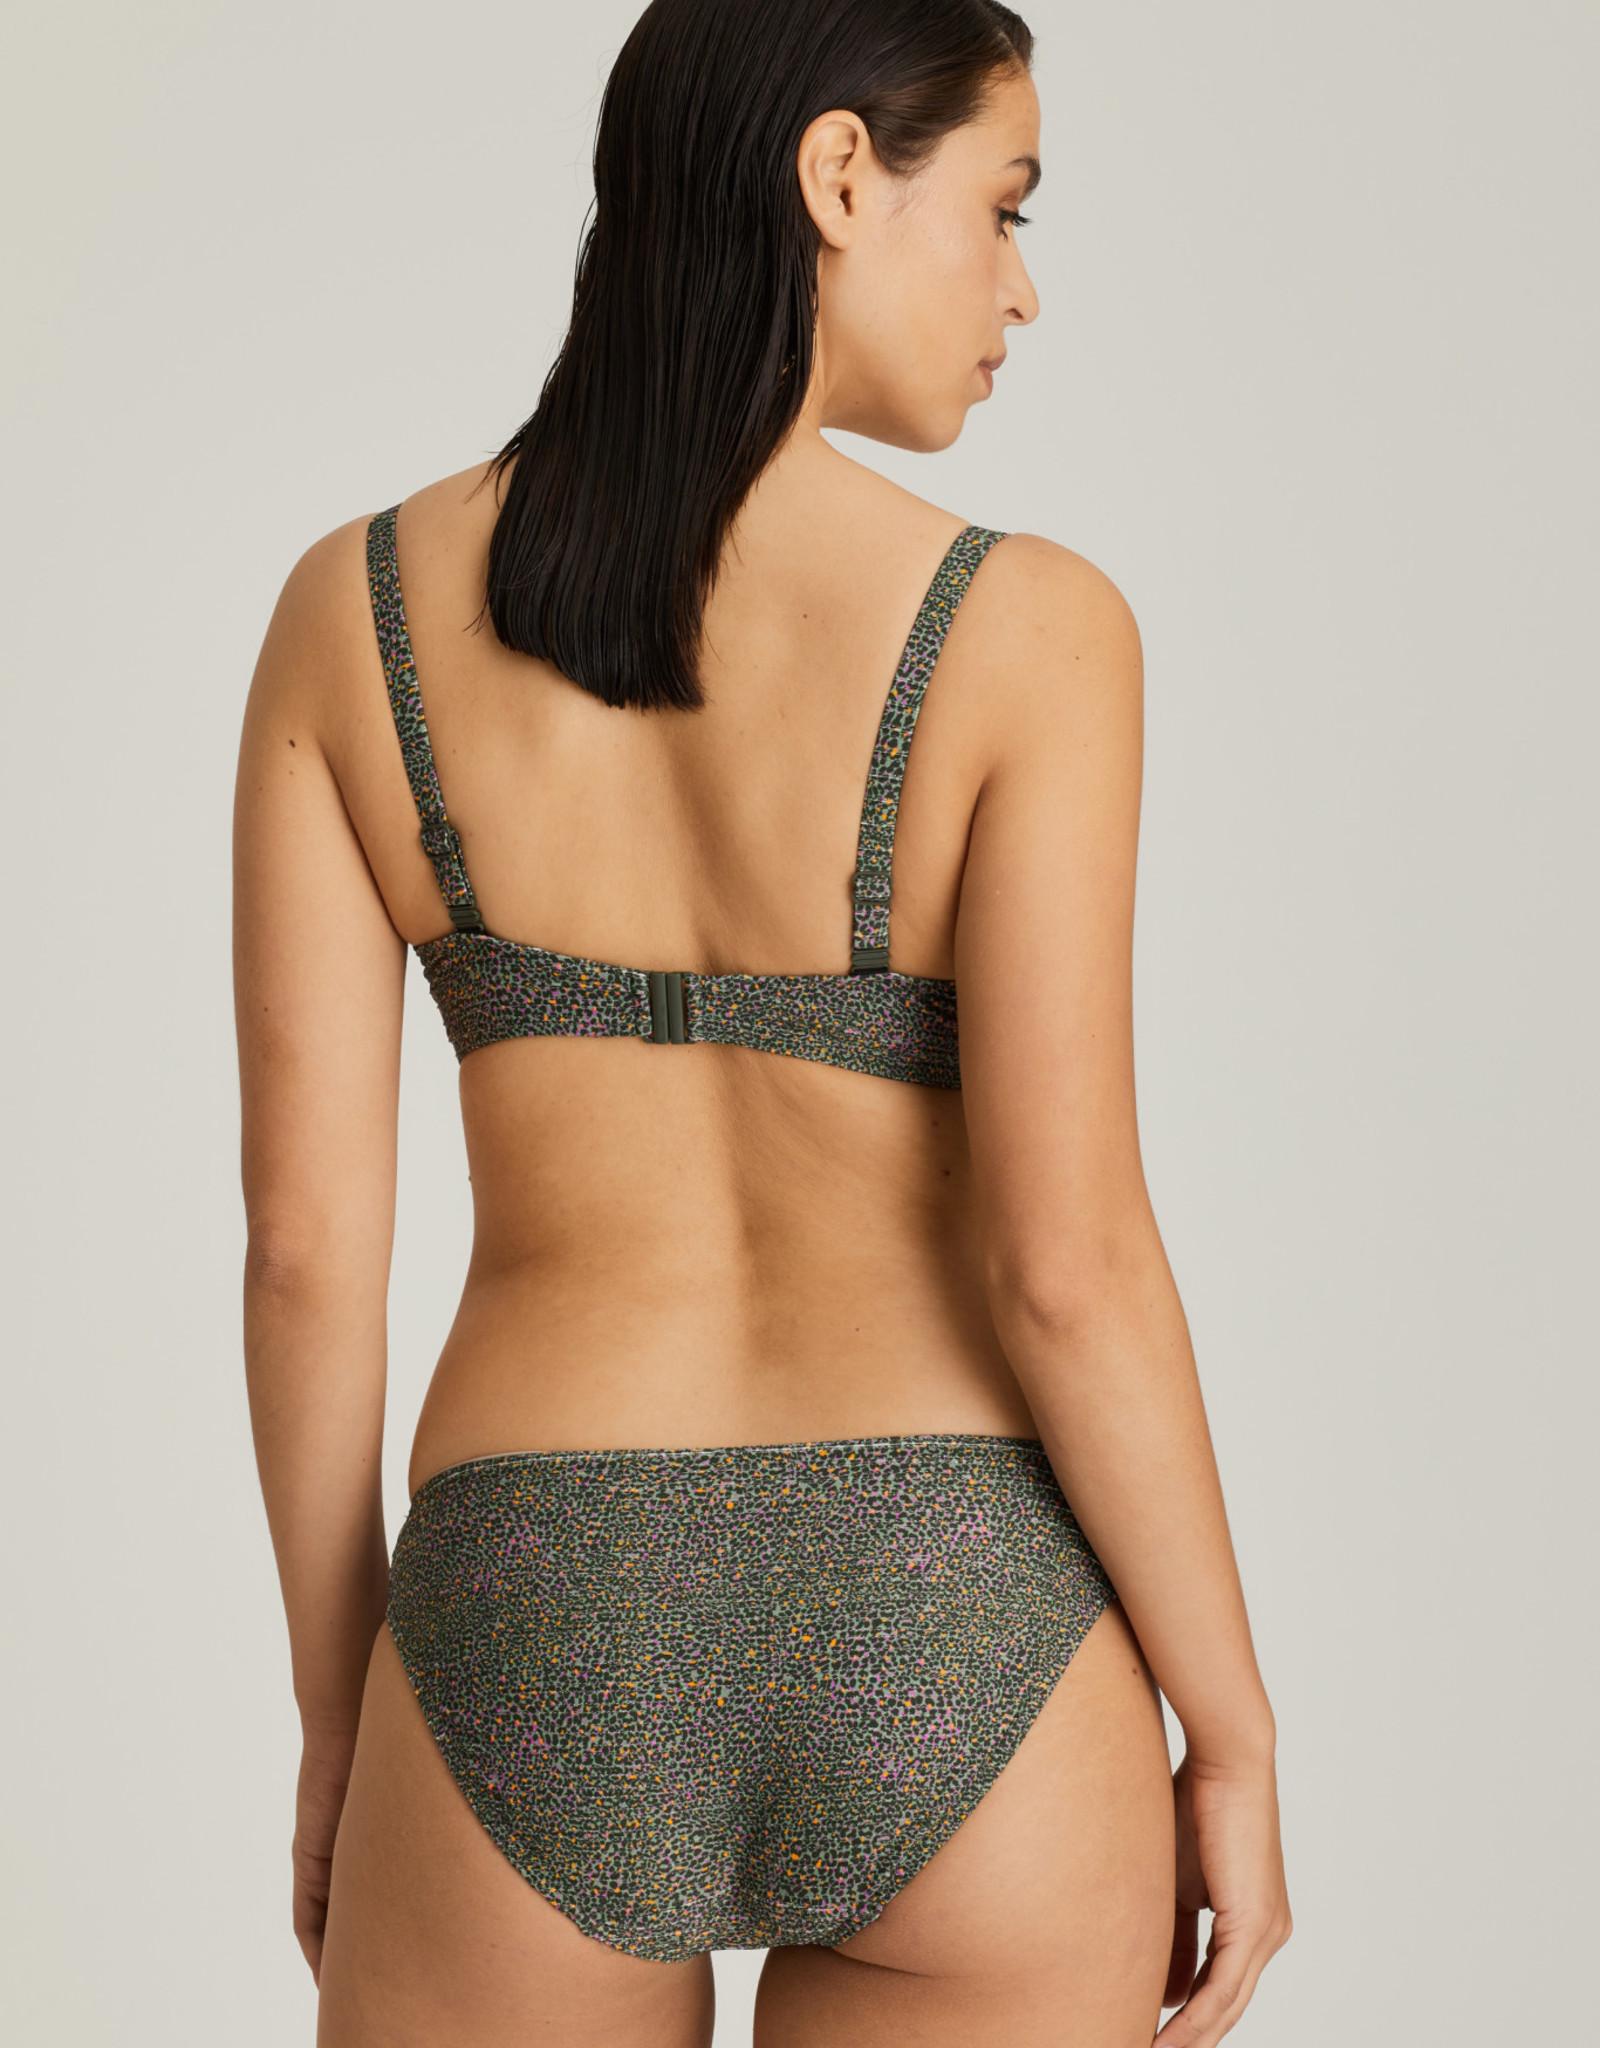 PrimaDonna Jacaranda - Bikini balconette top